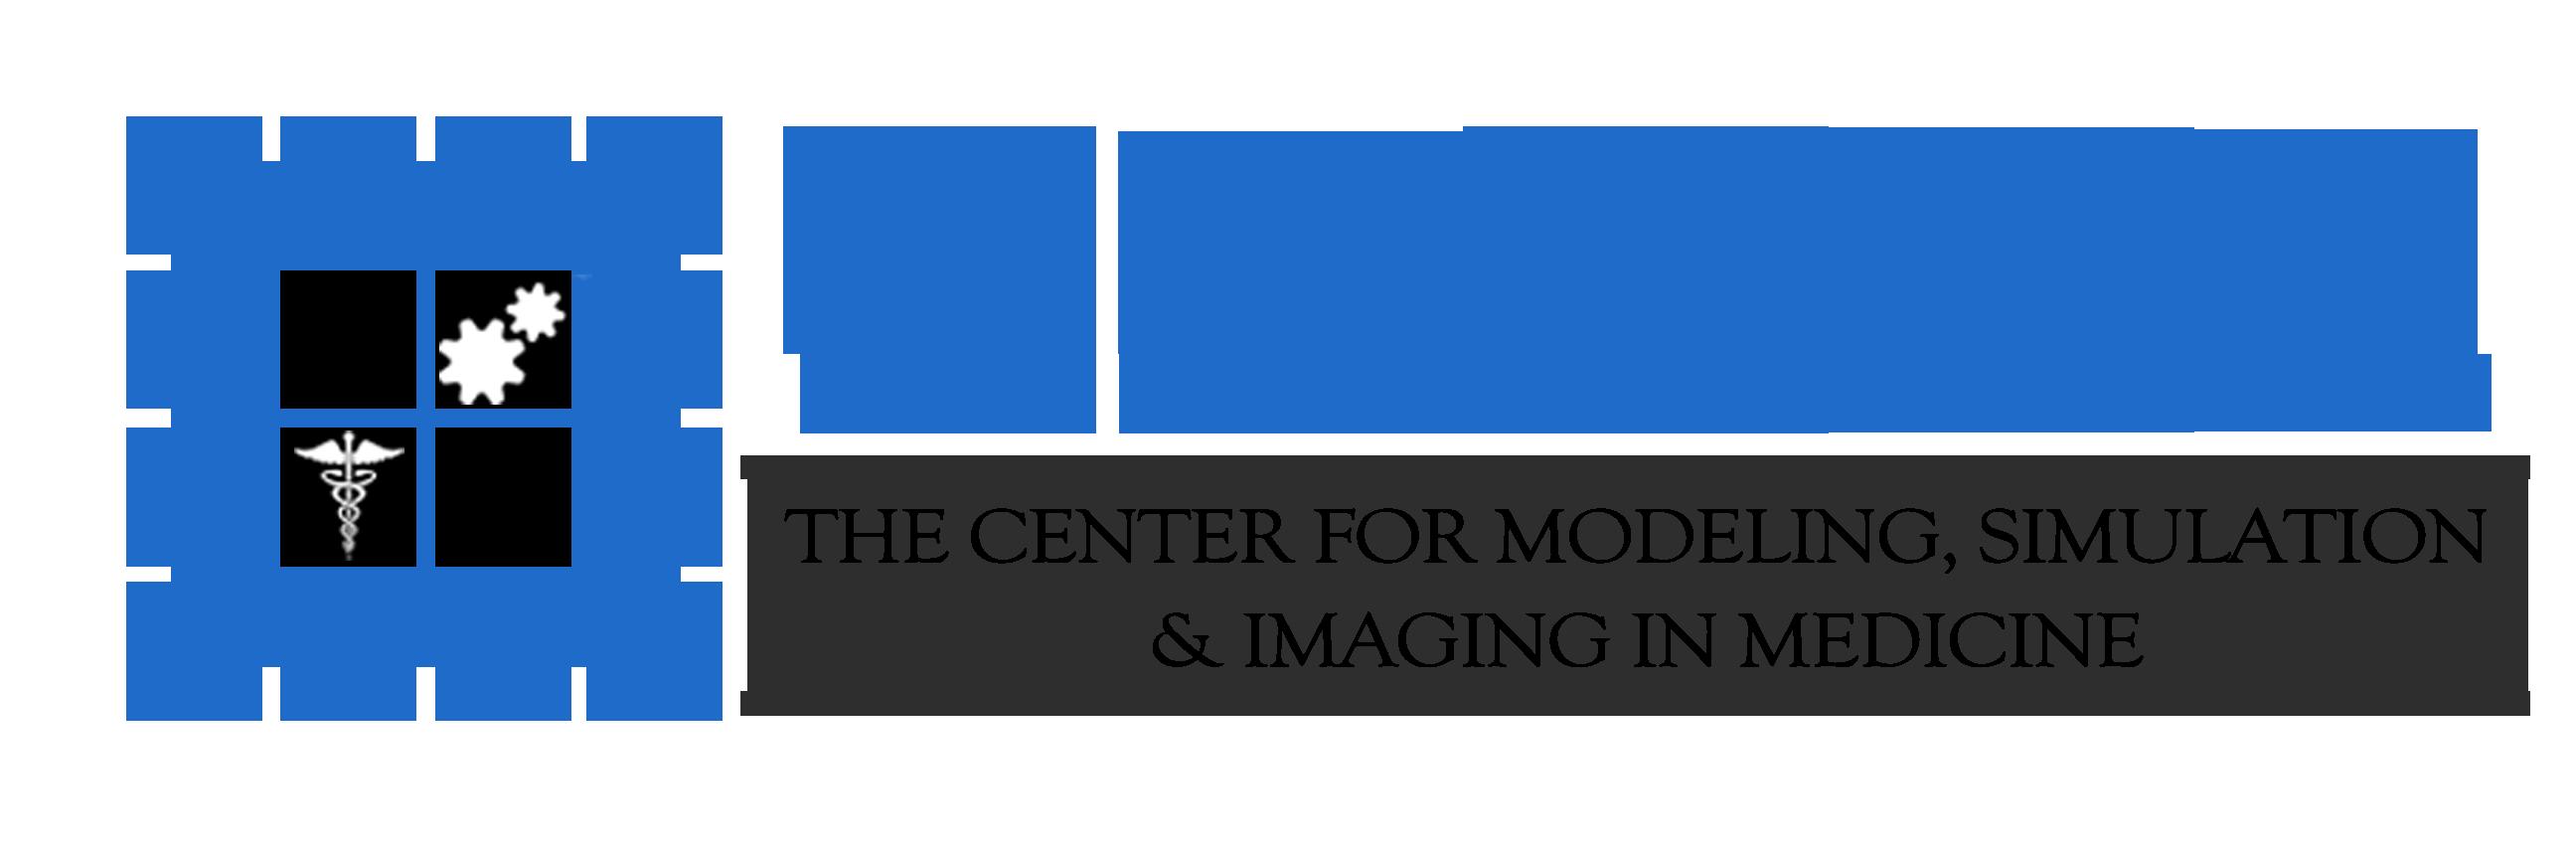 CeMSIM Logo